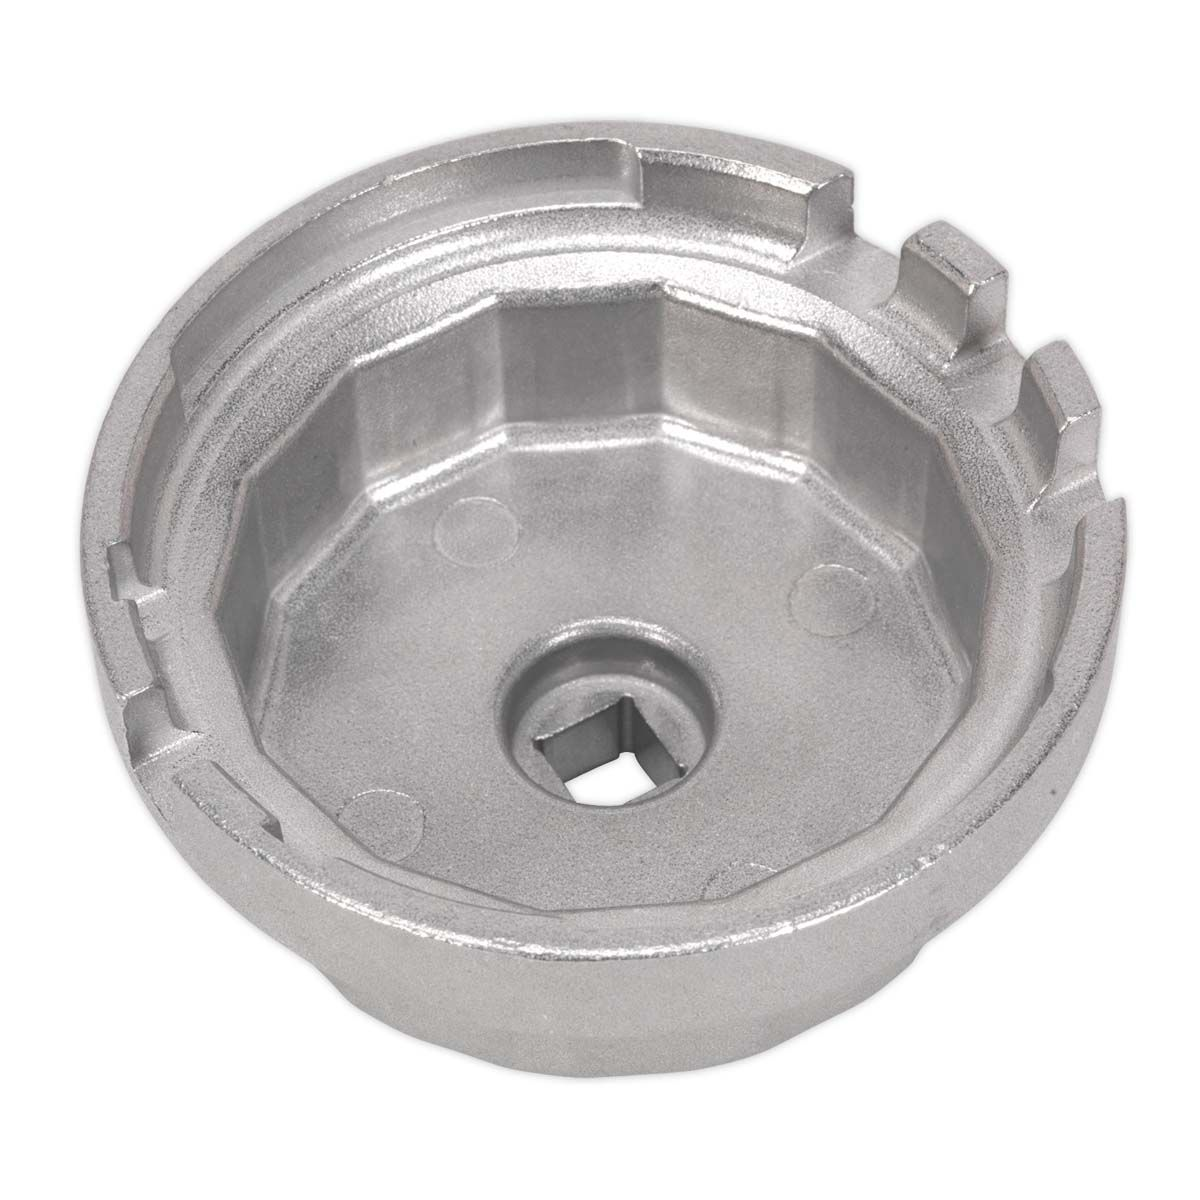 Sealey Oil Filter Cap Wrench Ø64.5mm x 14 Flutes - Lexus/Toyota